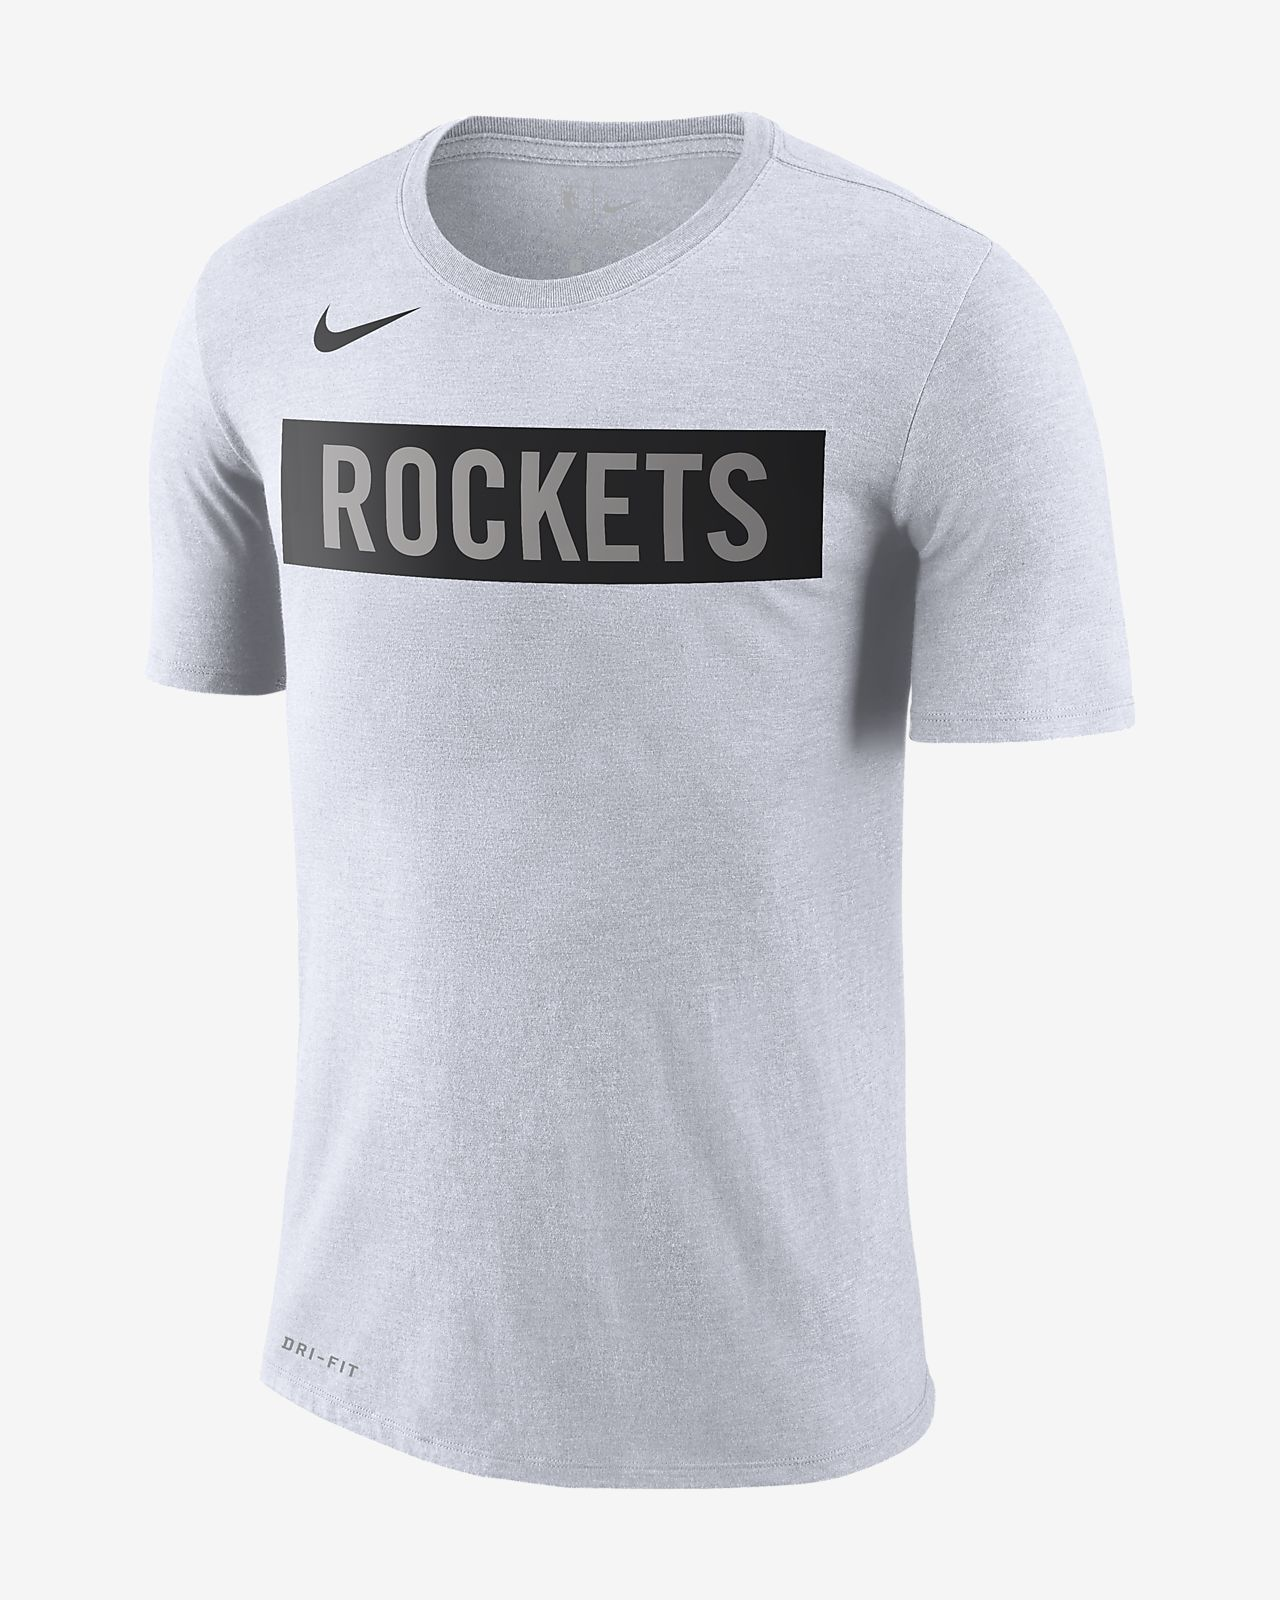 FIT NBA City für Logo Herren Shirt Edition Dri T Rockets Nike PTlOXiukZw